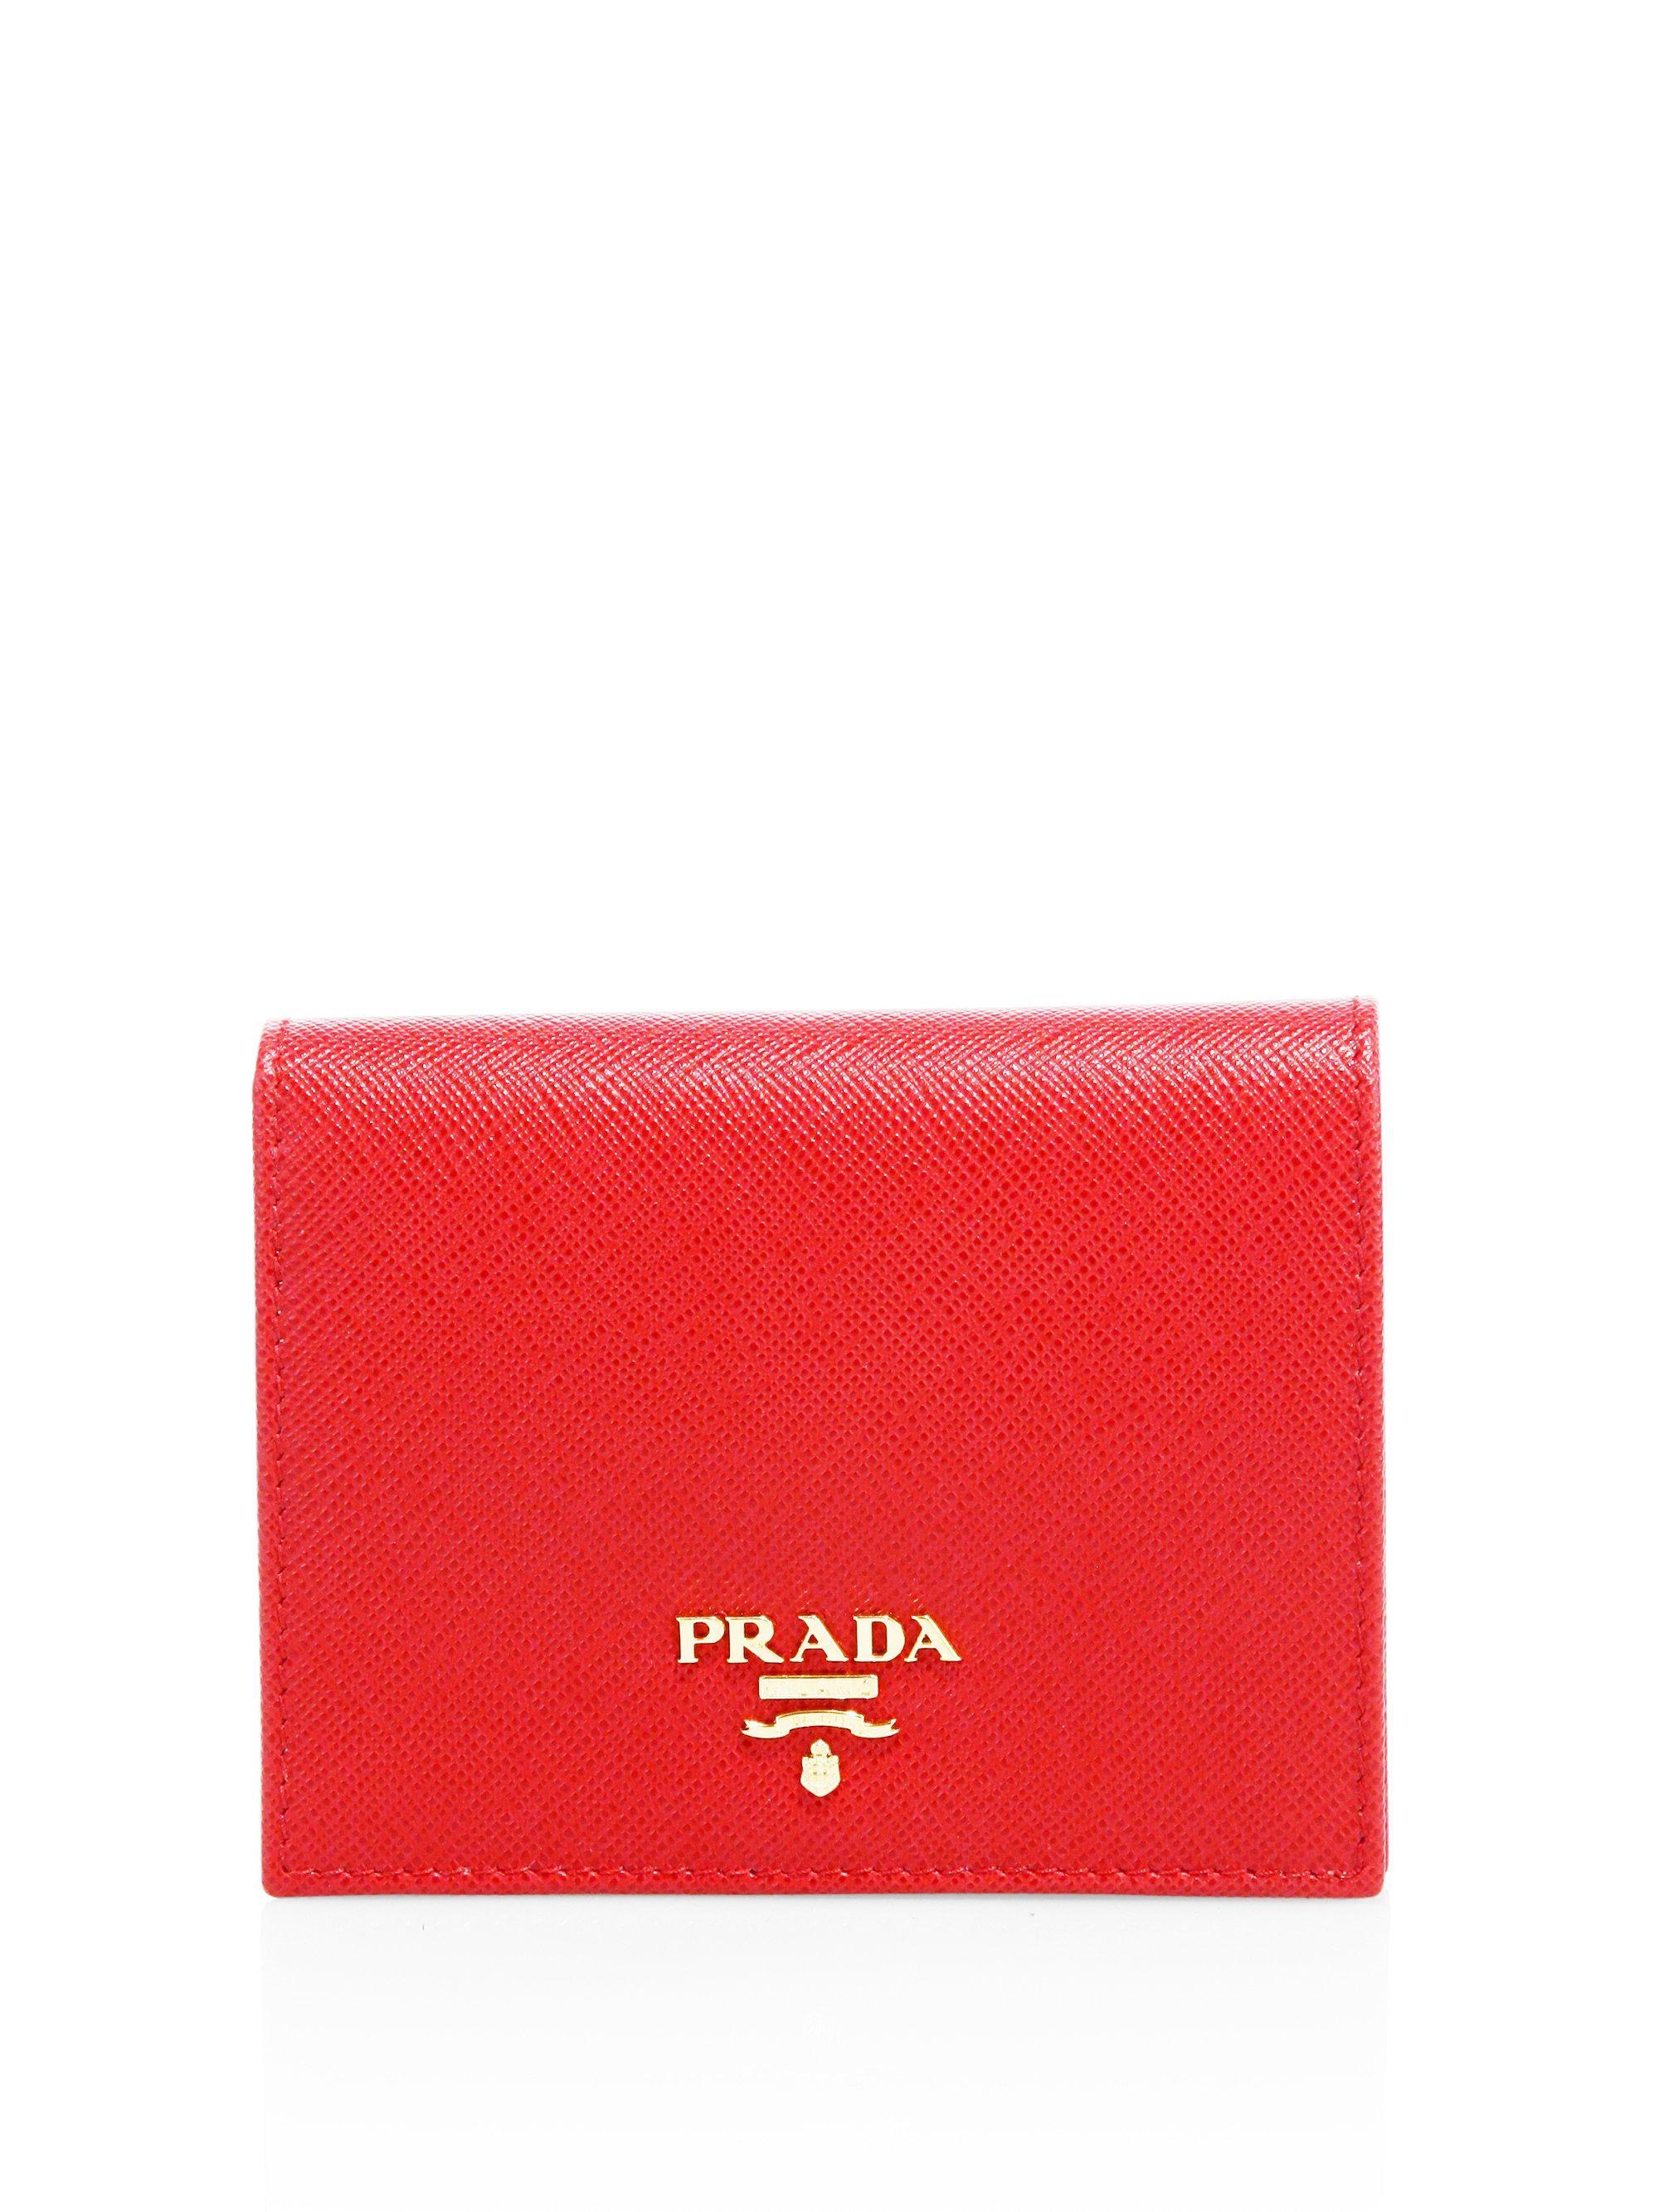 2deed98790fb ... where to buy prada red mini saffiano leather bifold wallet lyst. view  fullscreen 90055 adfc7